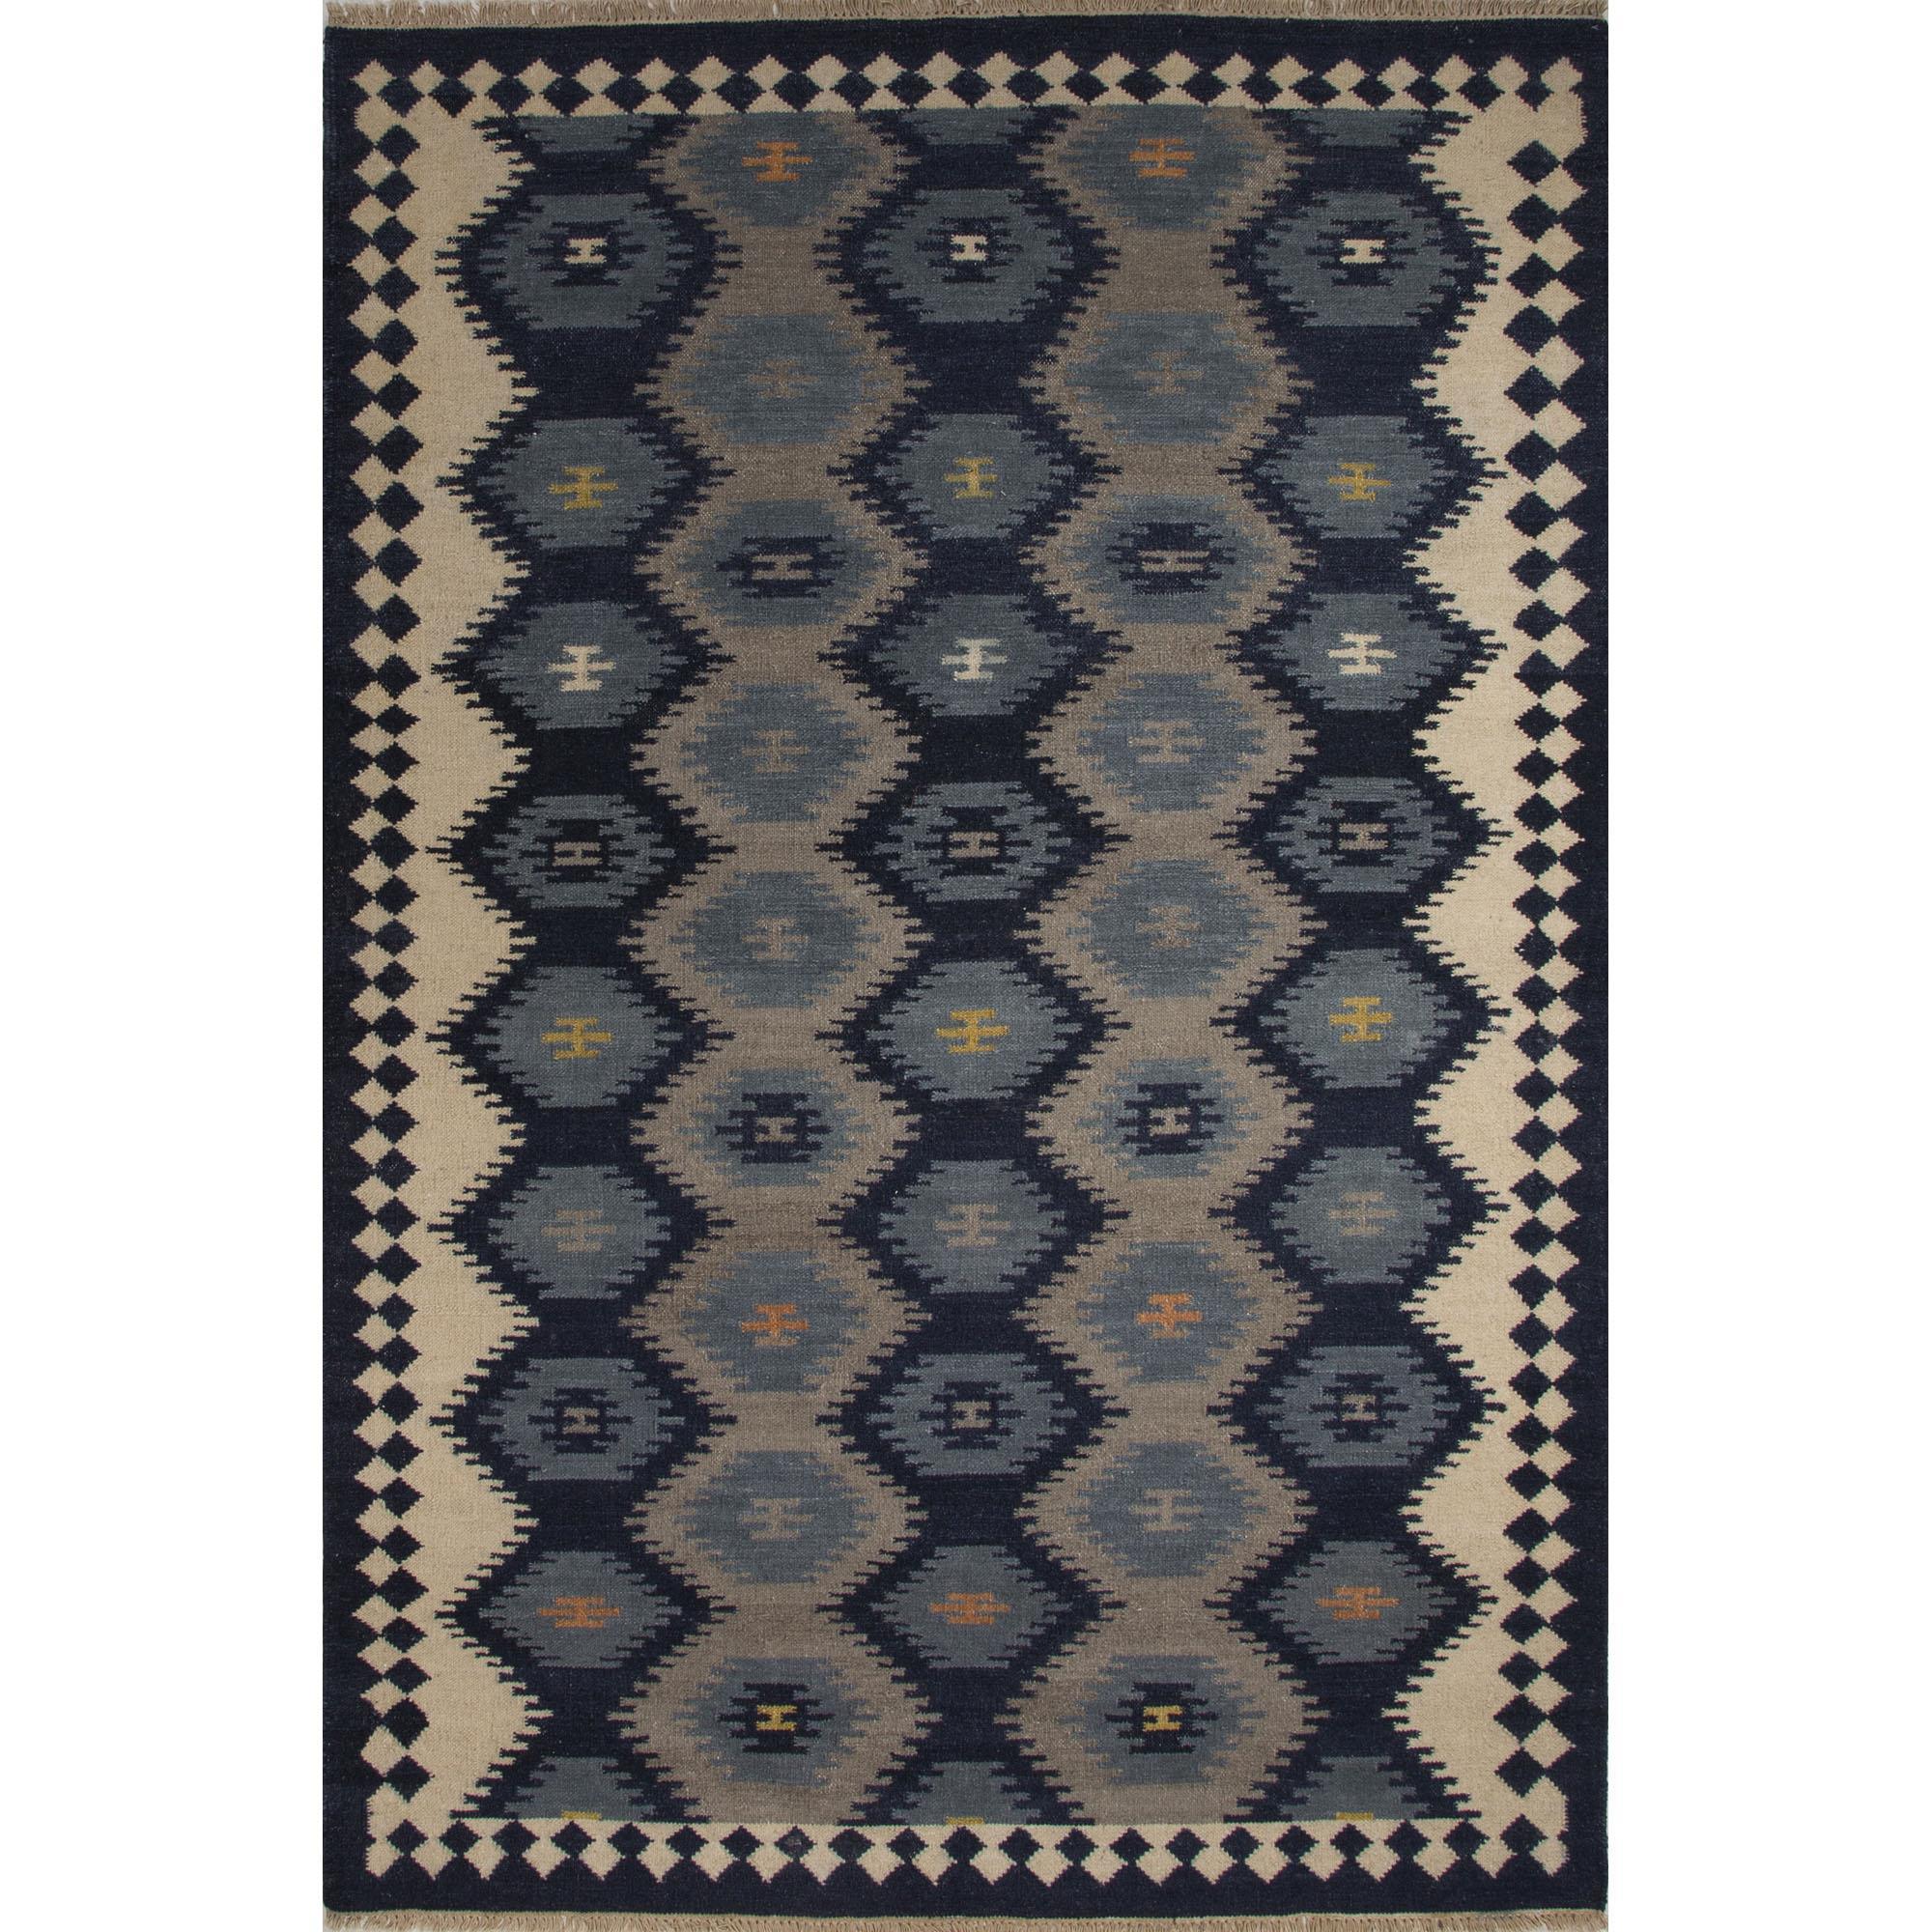 Anatolia 5 x 8 Rug by JAIPUR Living at Sprintz Furniture